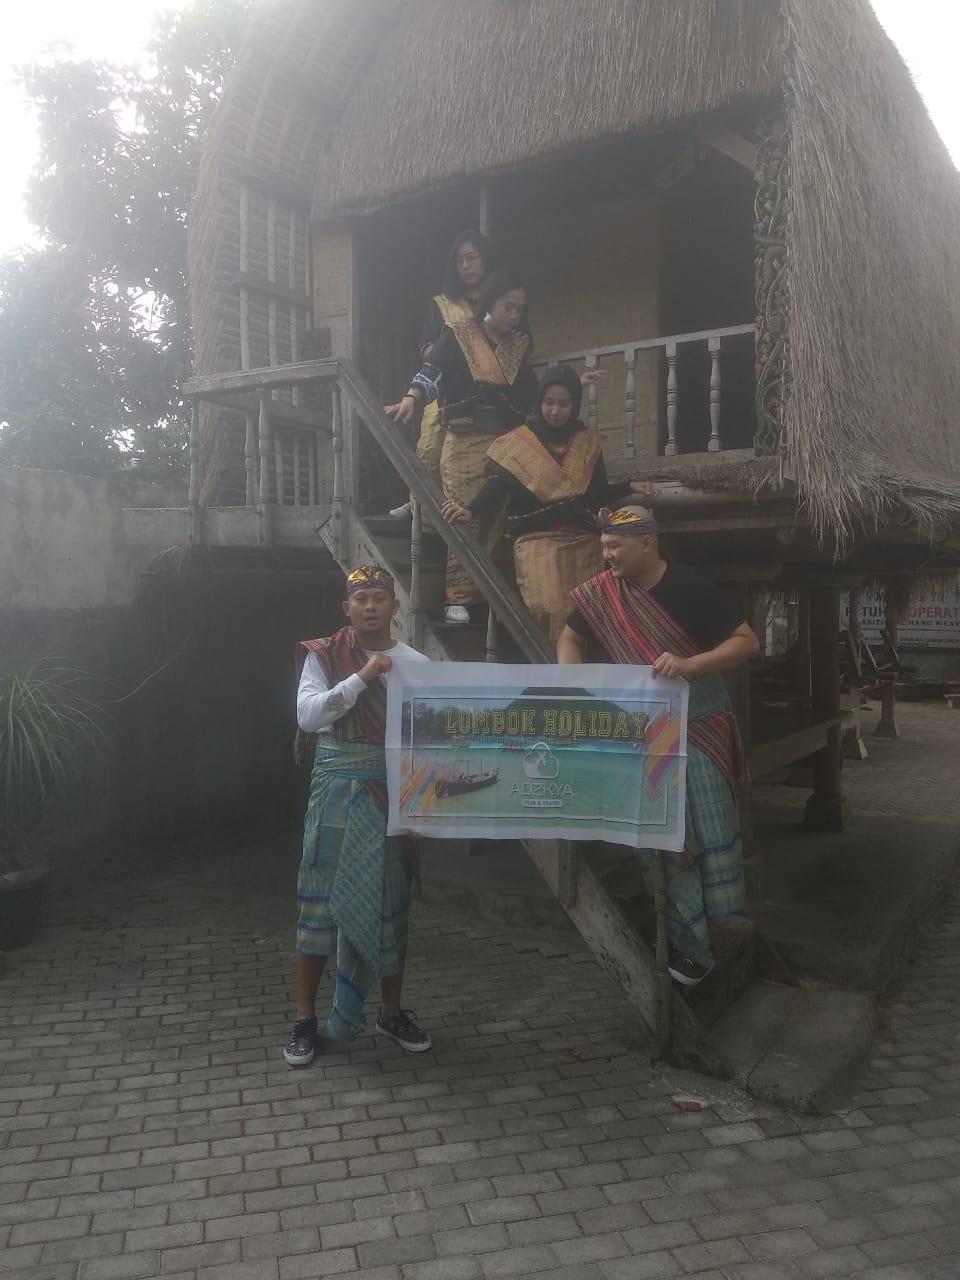 LOMBOK GILI TRAWANGAN 05 - 07 SEPT 2019